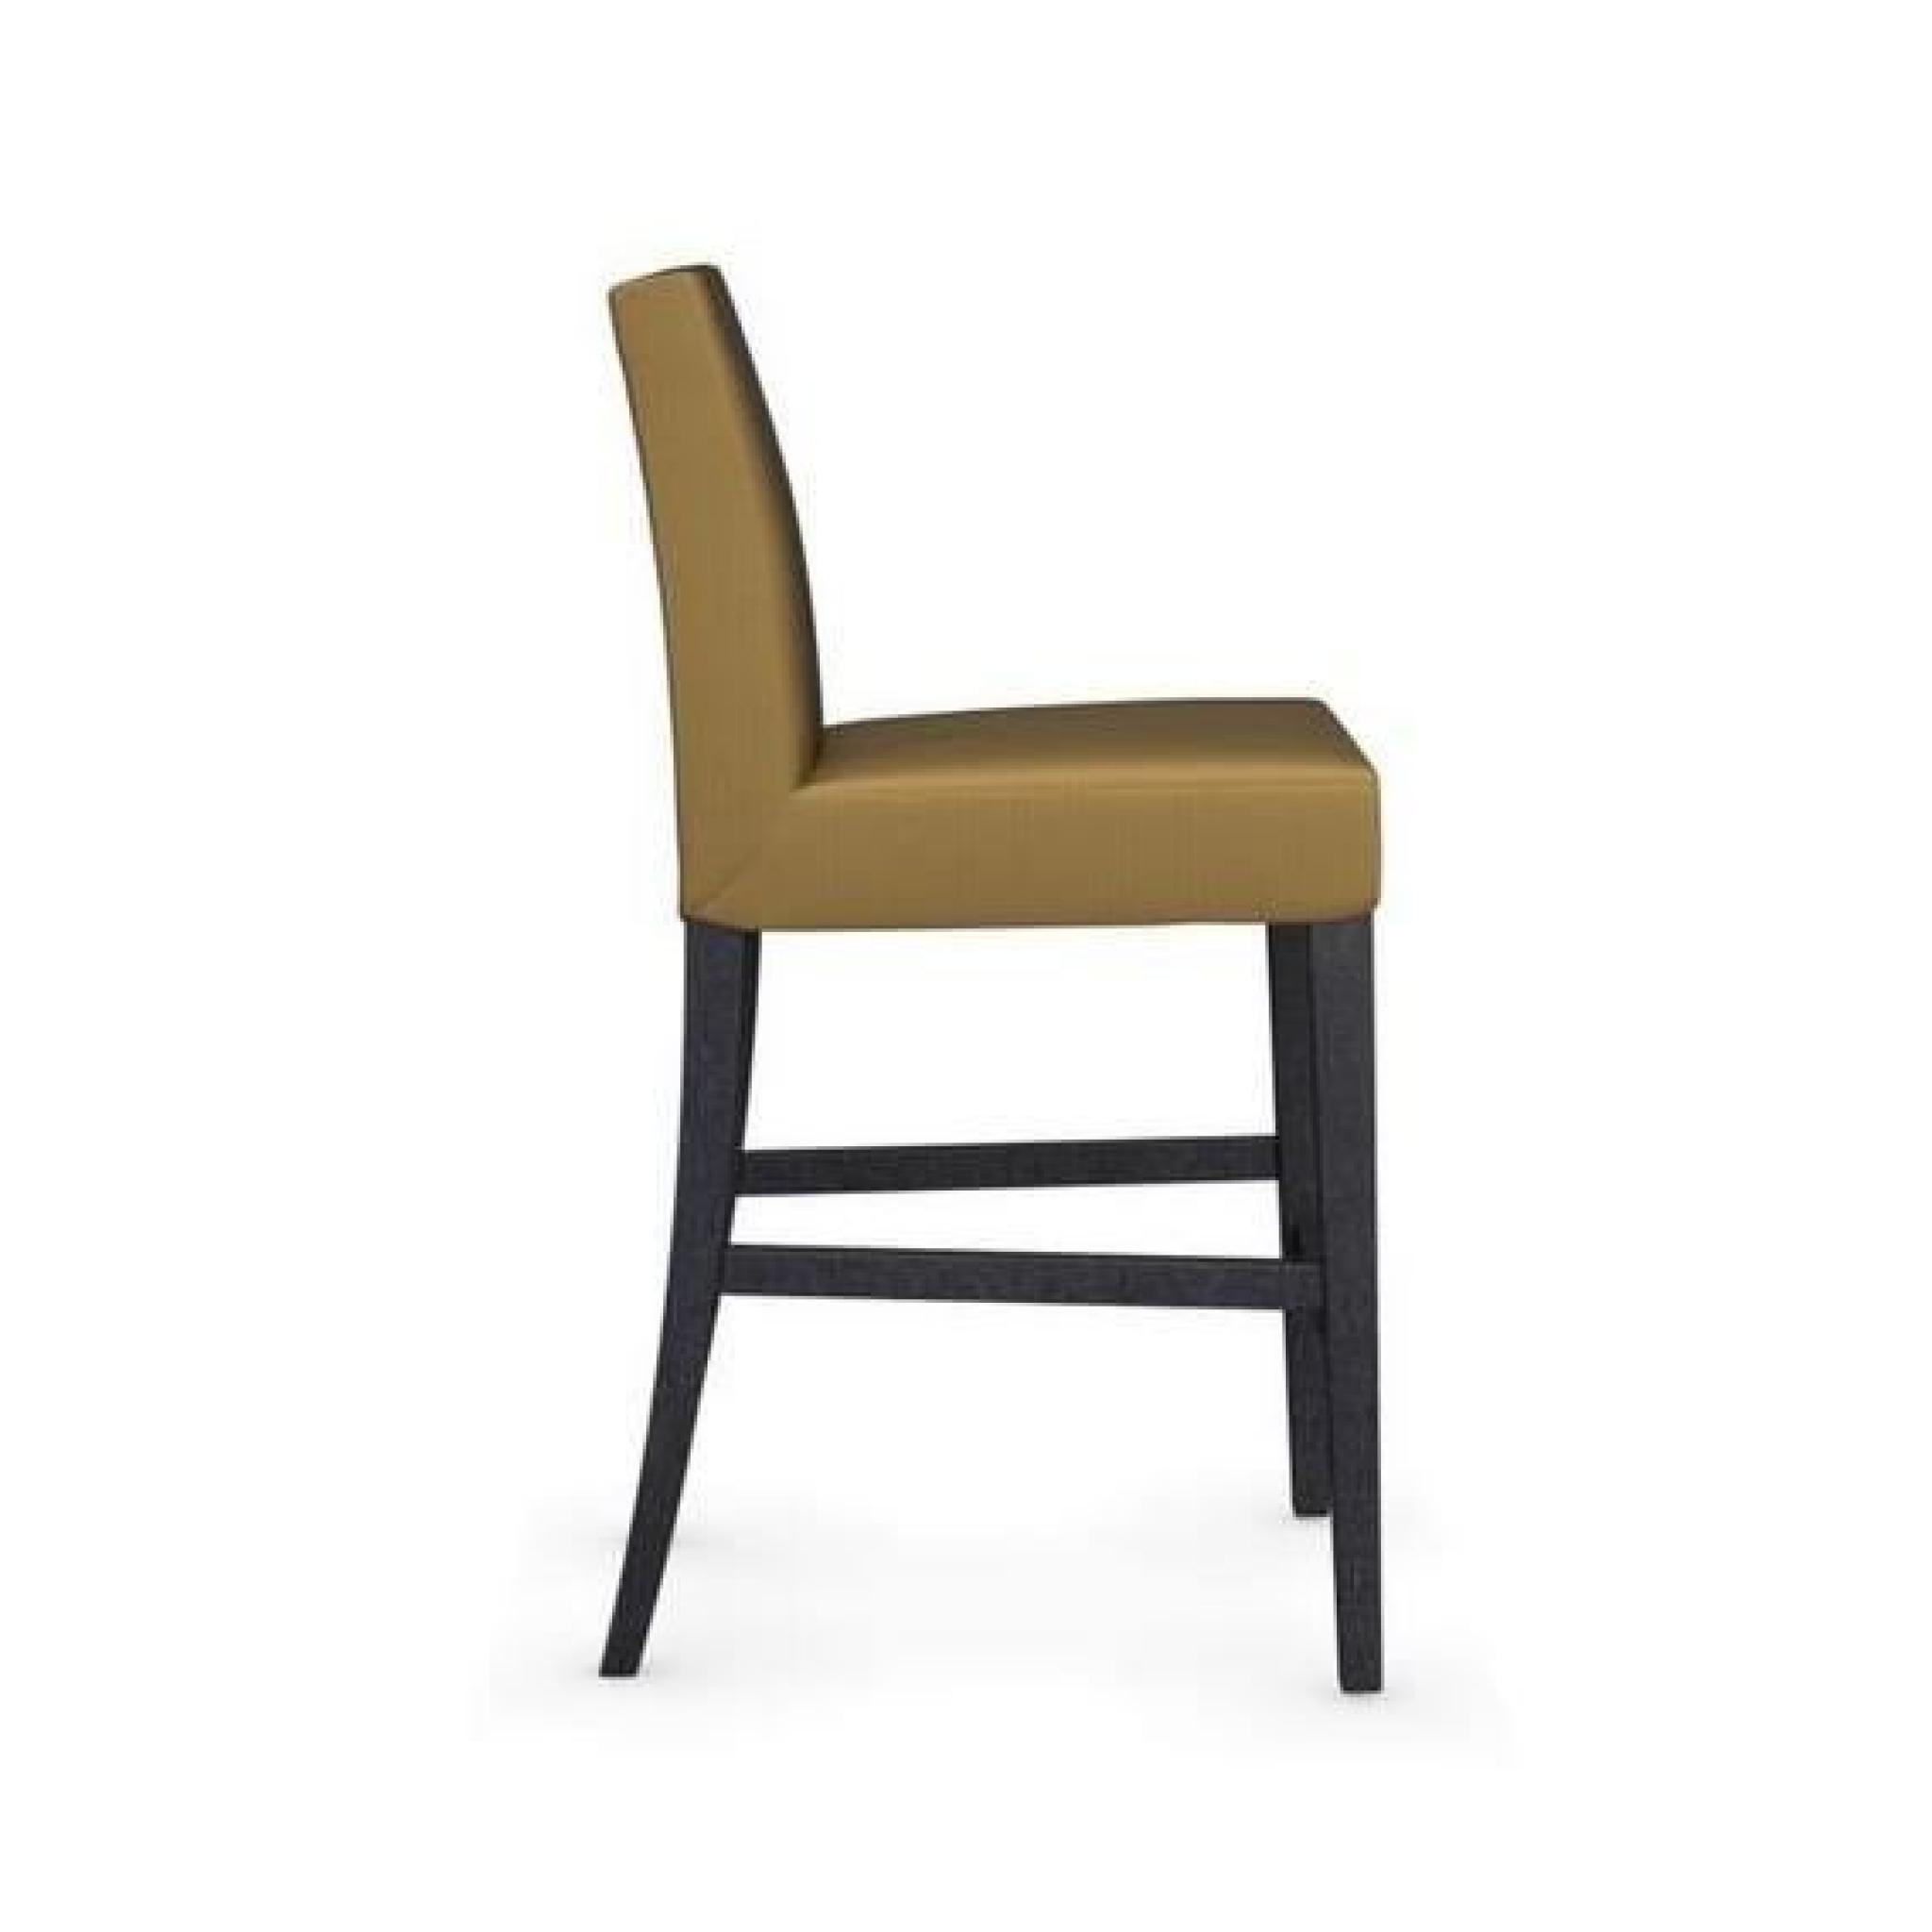 Chaise de bar latina de calligaris jaune moutar achat - Tabouret de cuisine design jaune ...